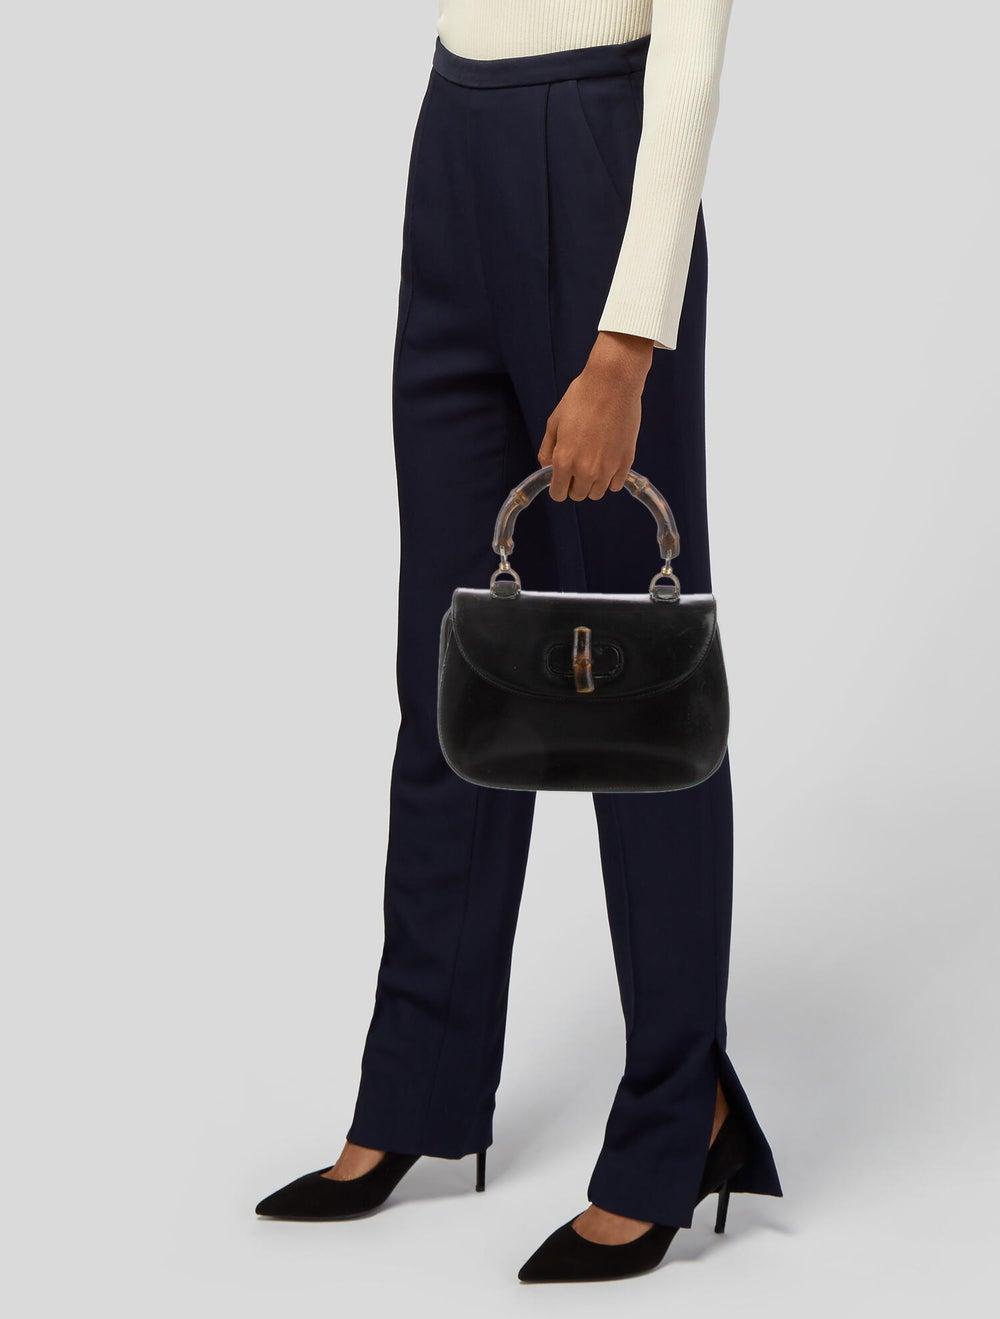 Gucci Vintage Leather Bamboo Top Handle Bag Black - image 2